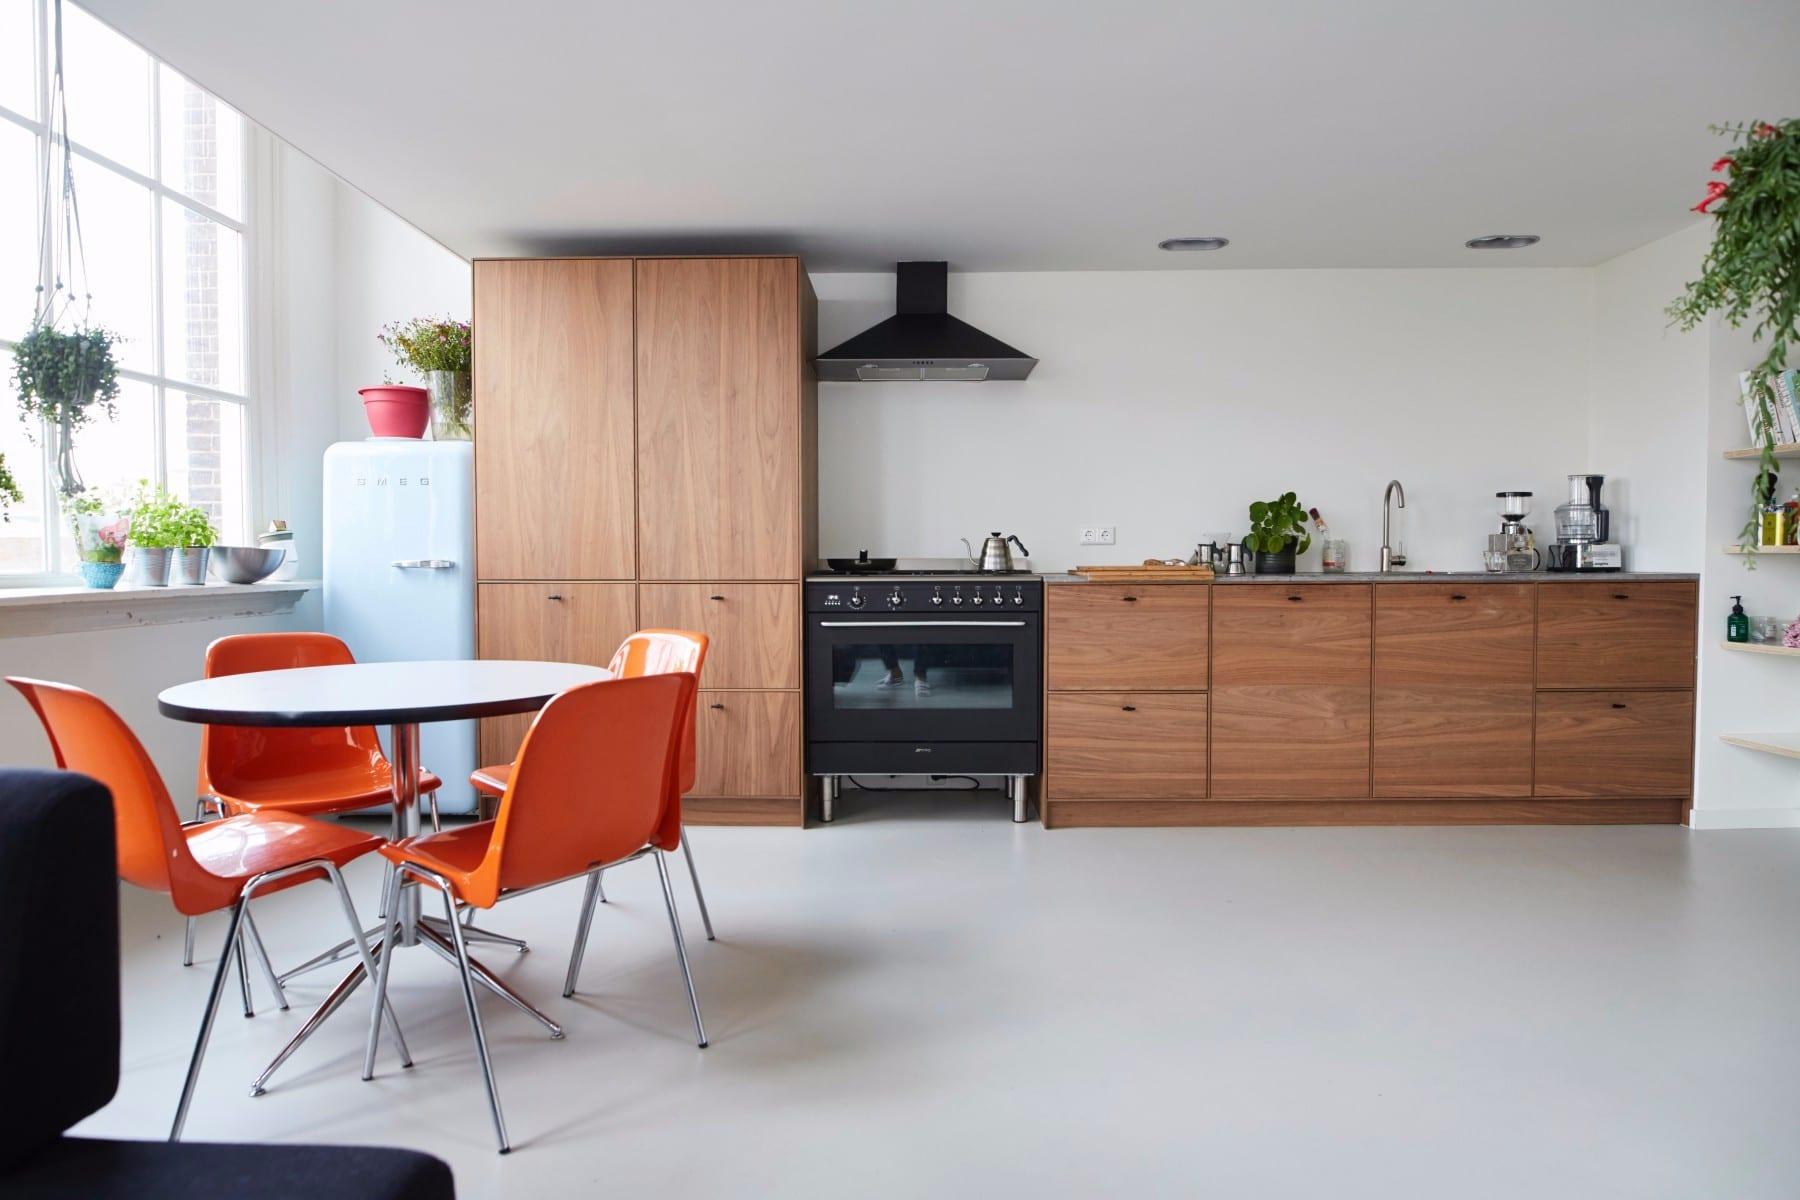 Keuken op maat meubelmakerij houtkwadraat - Keuken industriele loft ...